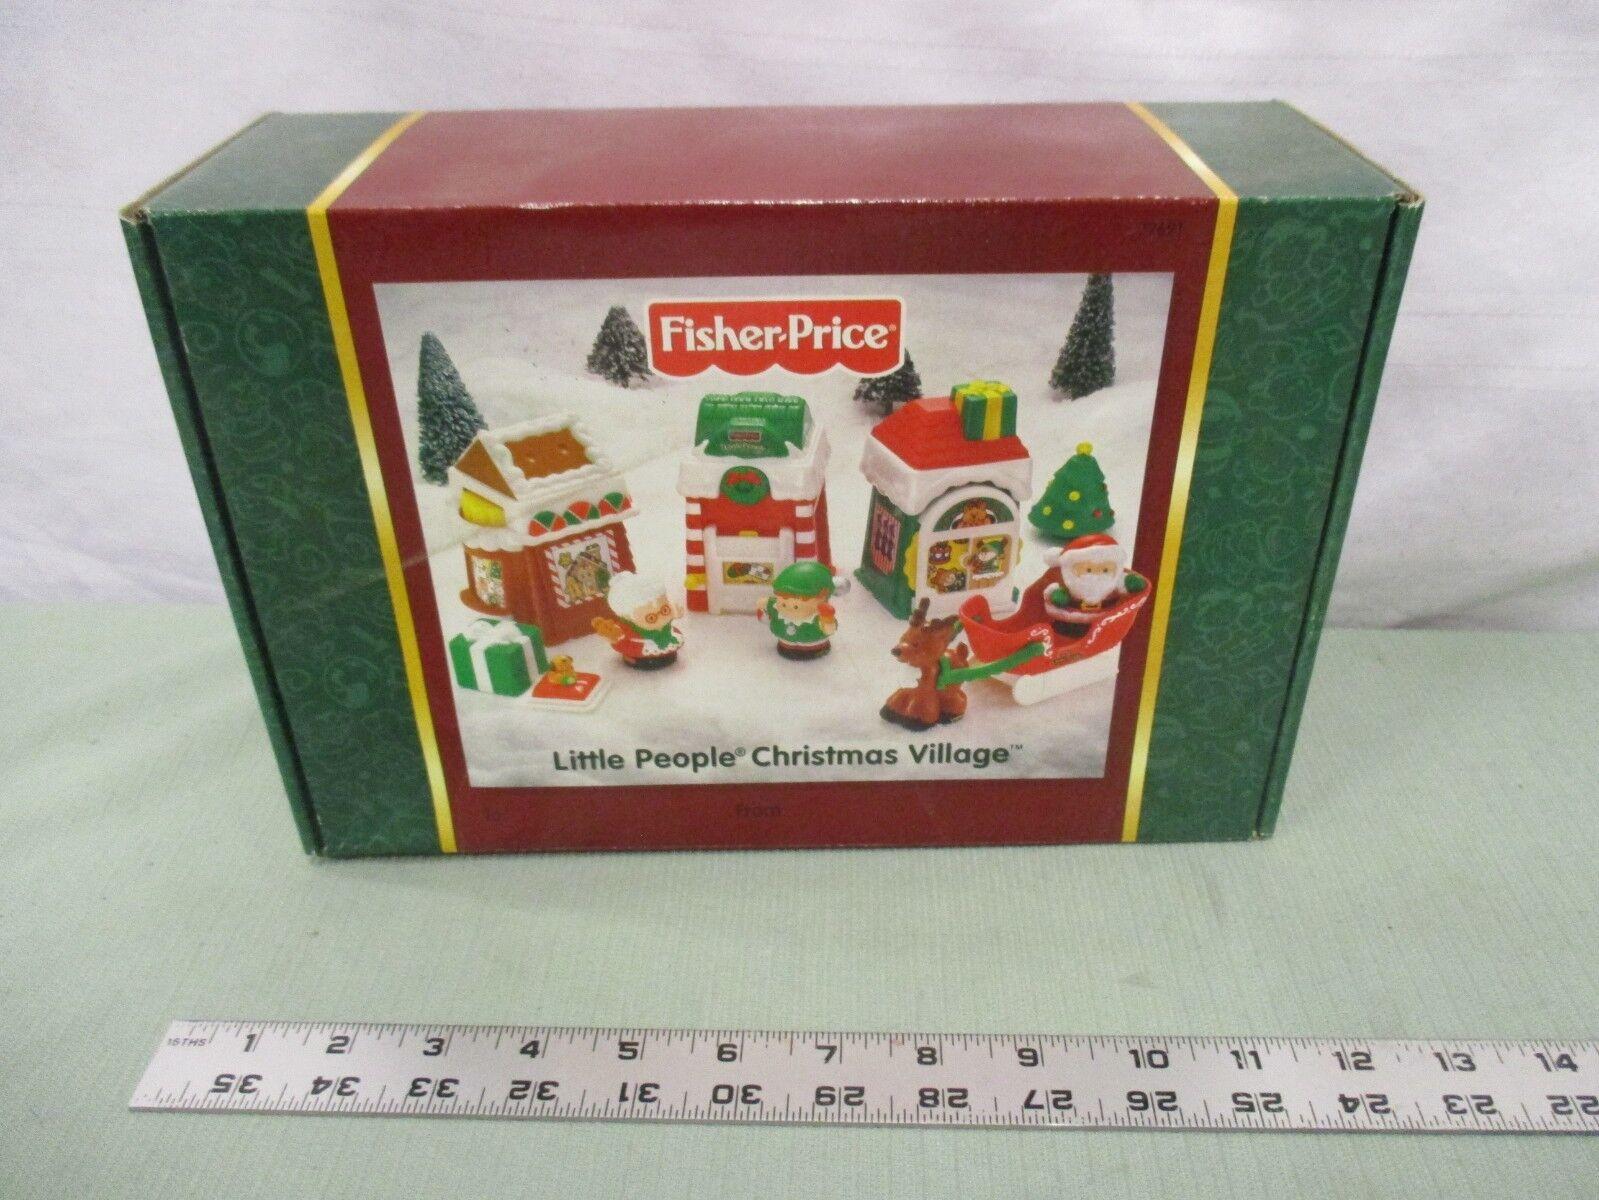 Fisher Price liten människor Jul New Santa Village presenterar släde Elf Mrs.